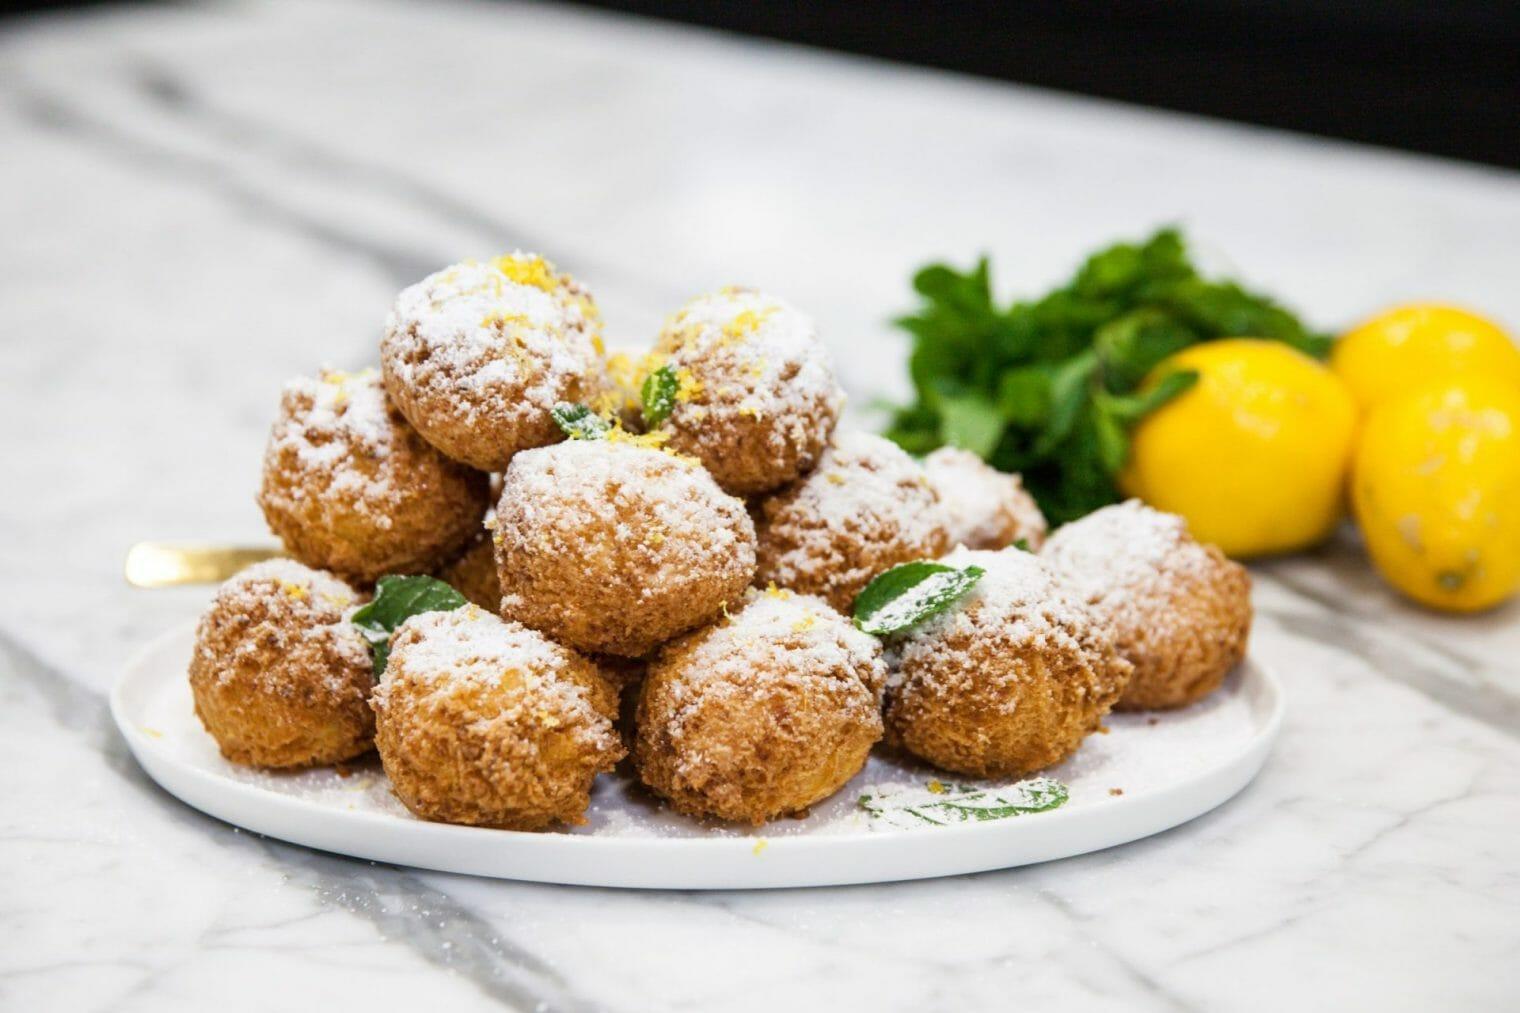 Gluten Free Ricotta Donuts